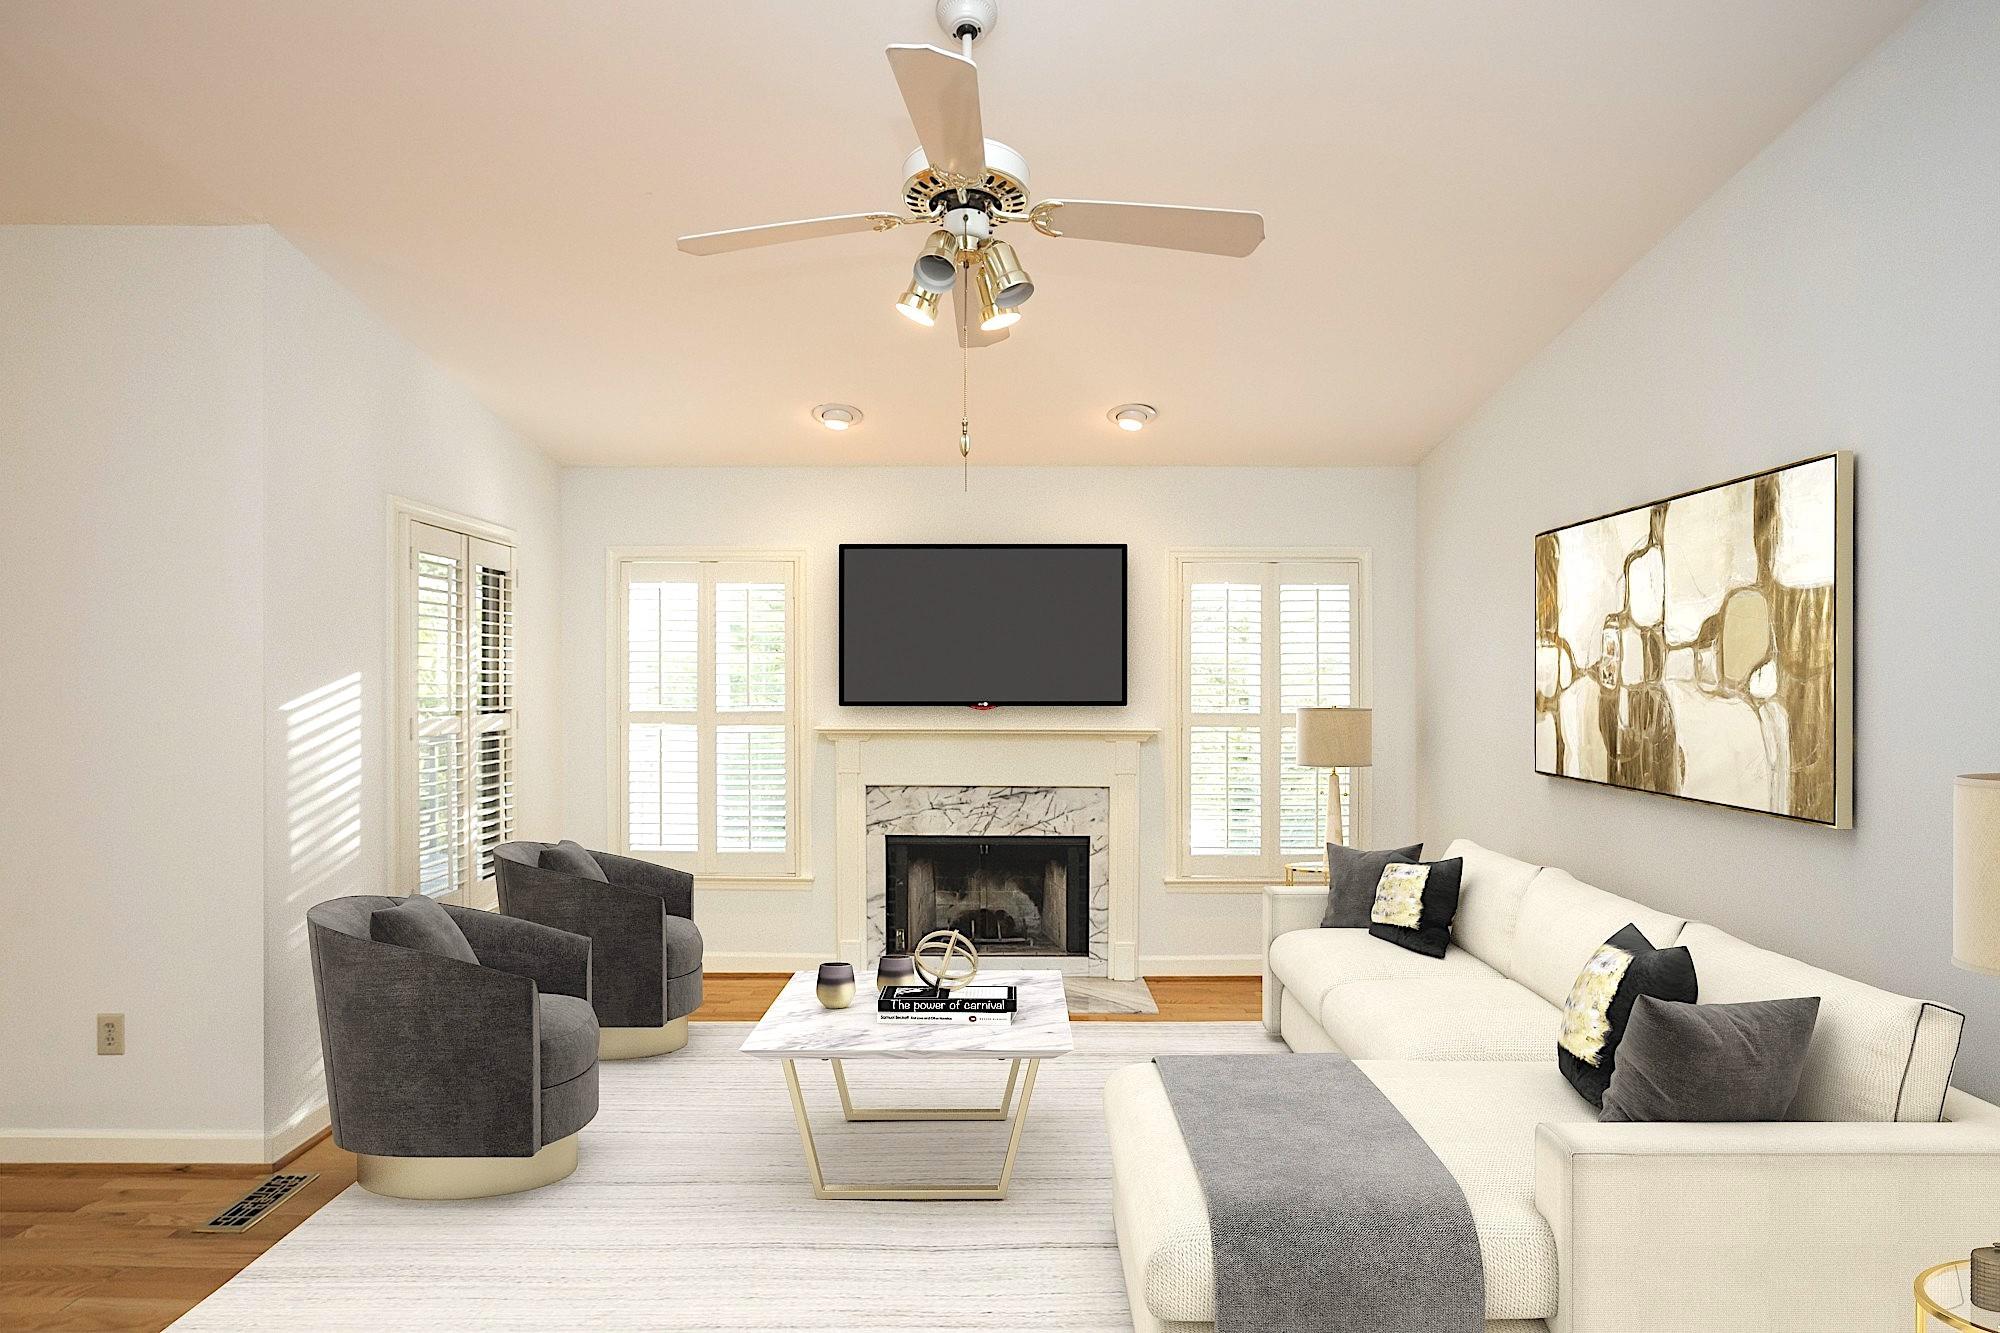 104 Morton Mill Cir Property Photo - Nashville, TN real estate listing